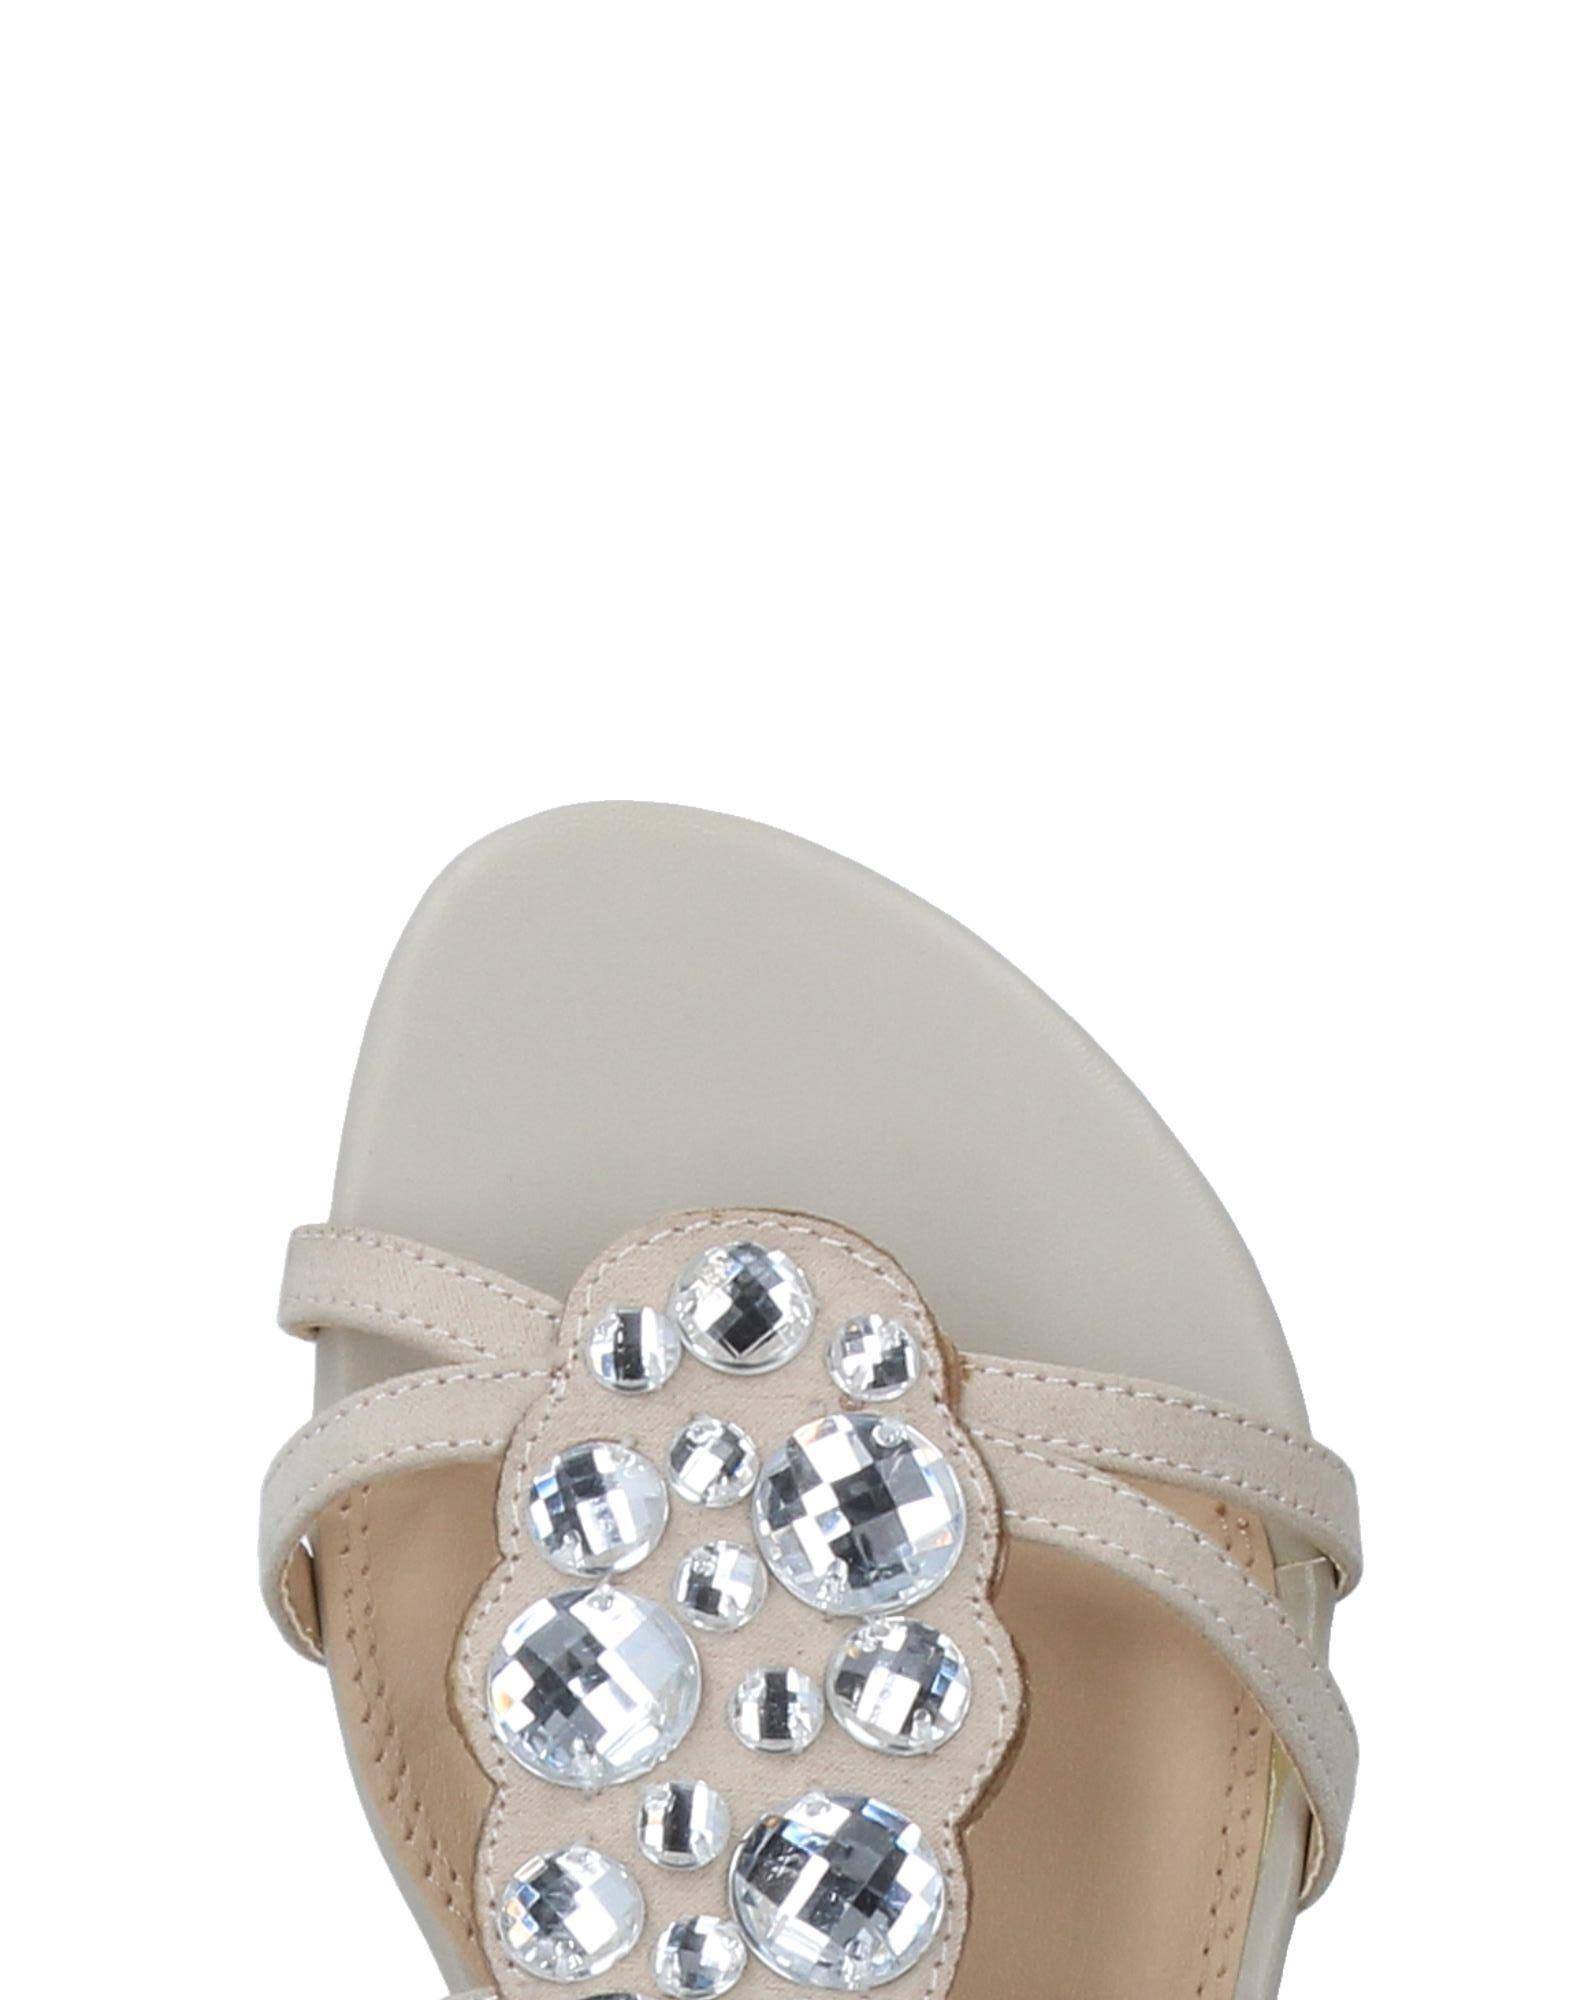 Alberto Moretti Sandalen Damen  11207352AR Gute Qualität beliebte beliebte beliebte Schuhe 3e53ec